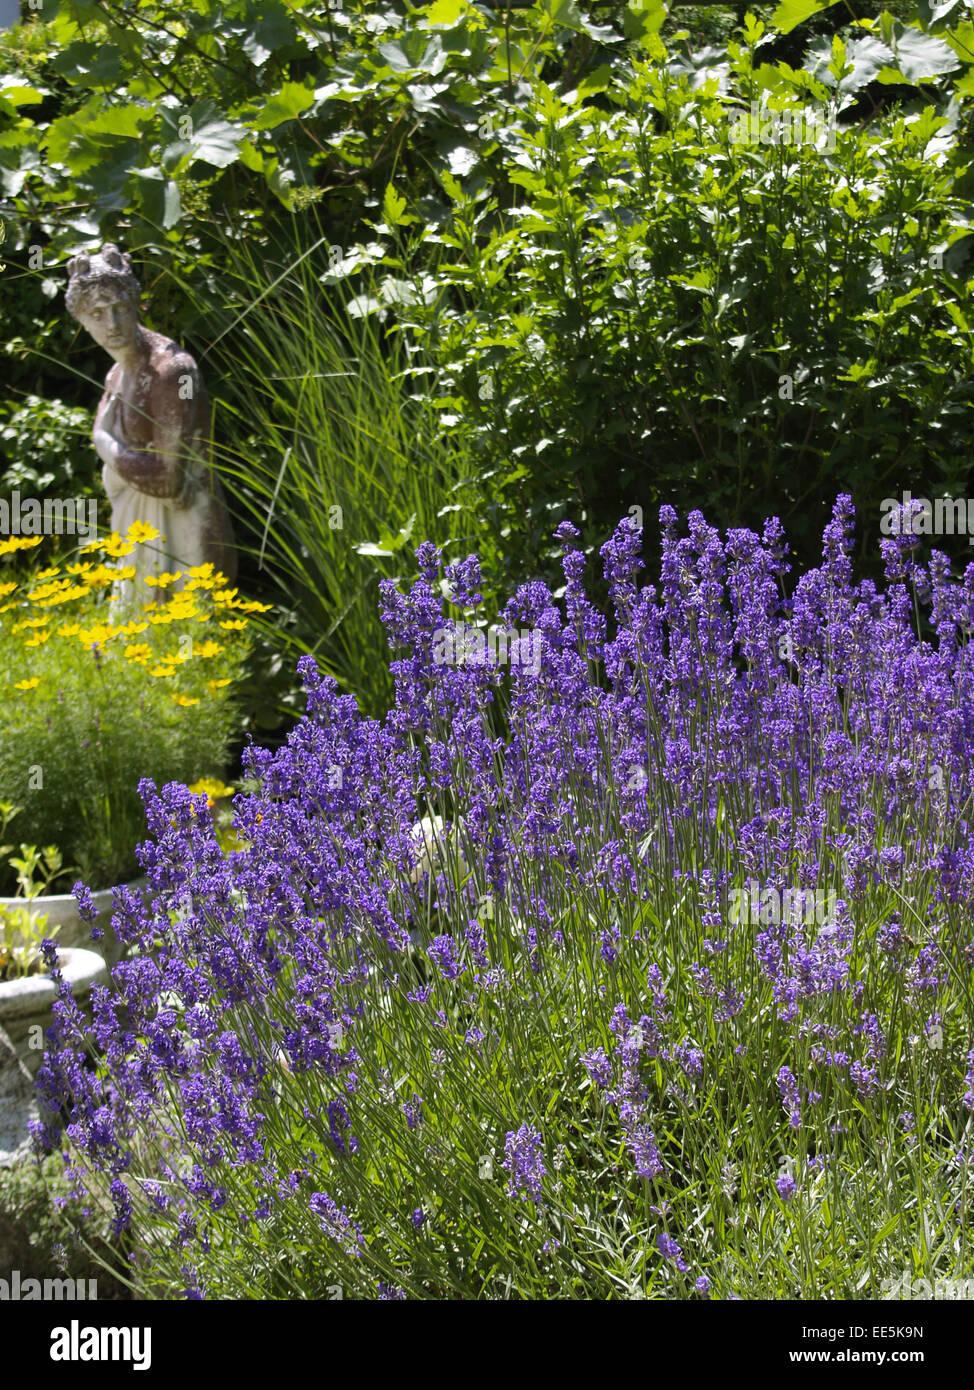 Blumen garten  Aroma, Blume, Blumen, Blumengarten, Blueten, Duft, Feld, Garten ...